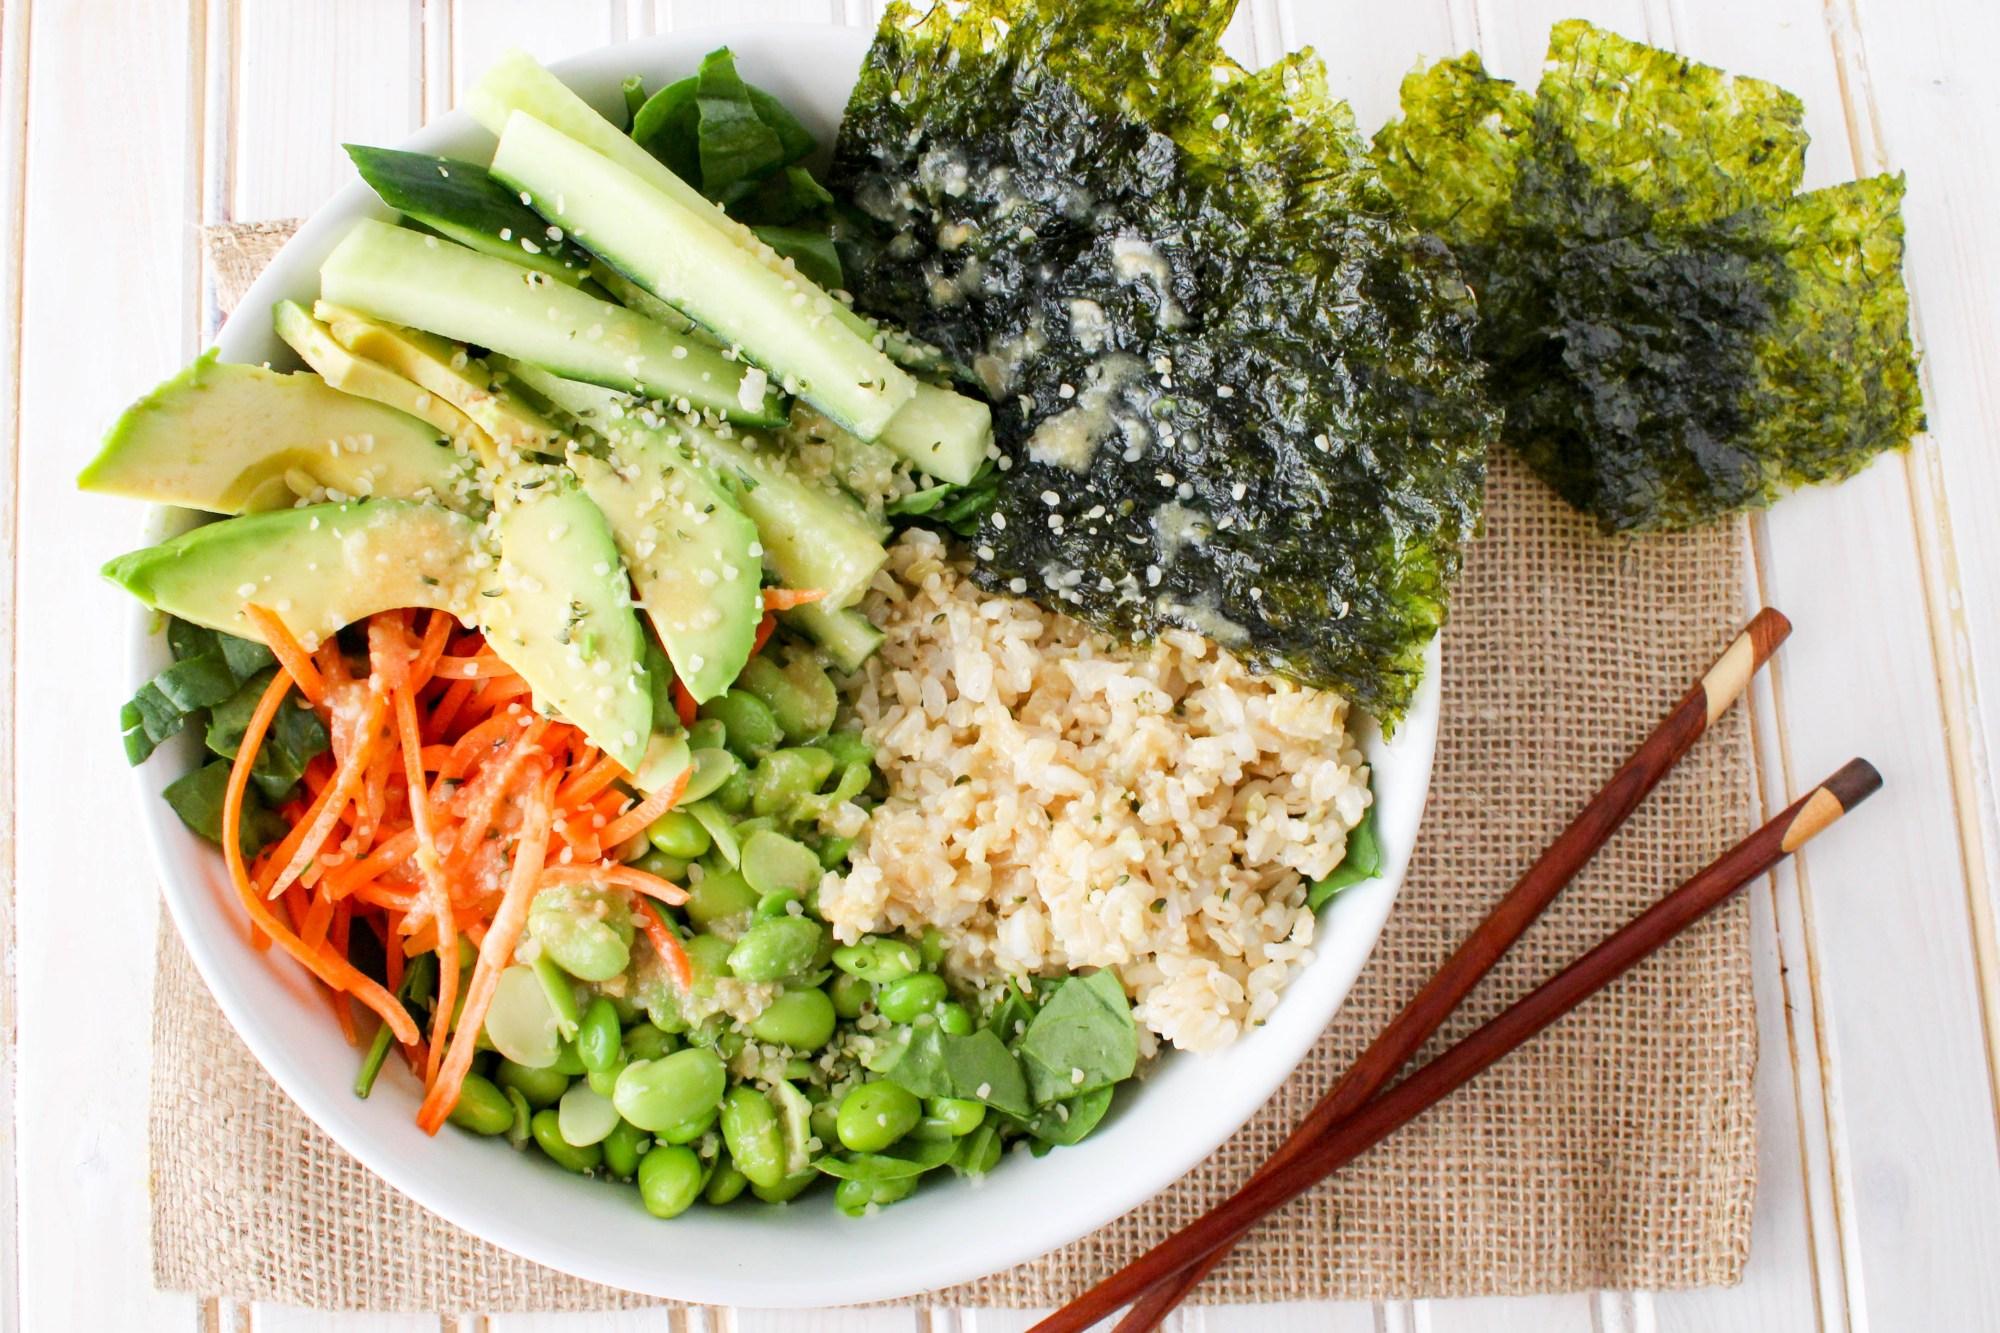 Vegan Deconstructed Sushi Salad Bowl with Sesame Ginger Miso Dressing - Stephanie McKercher, RD of The Grateful Grazer